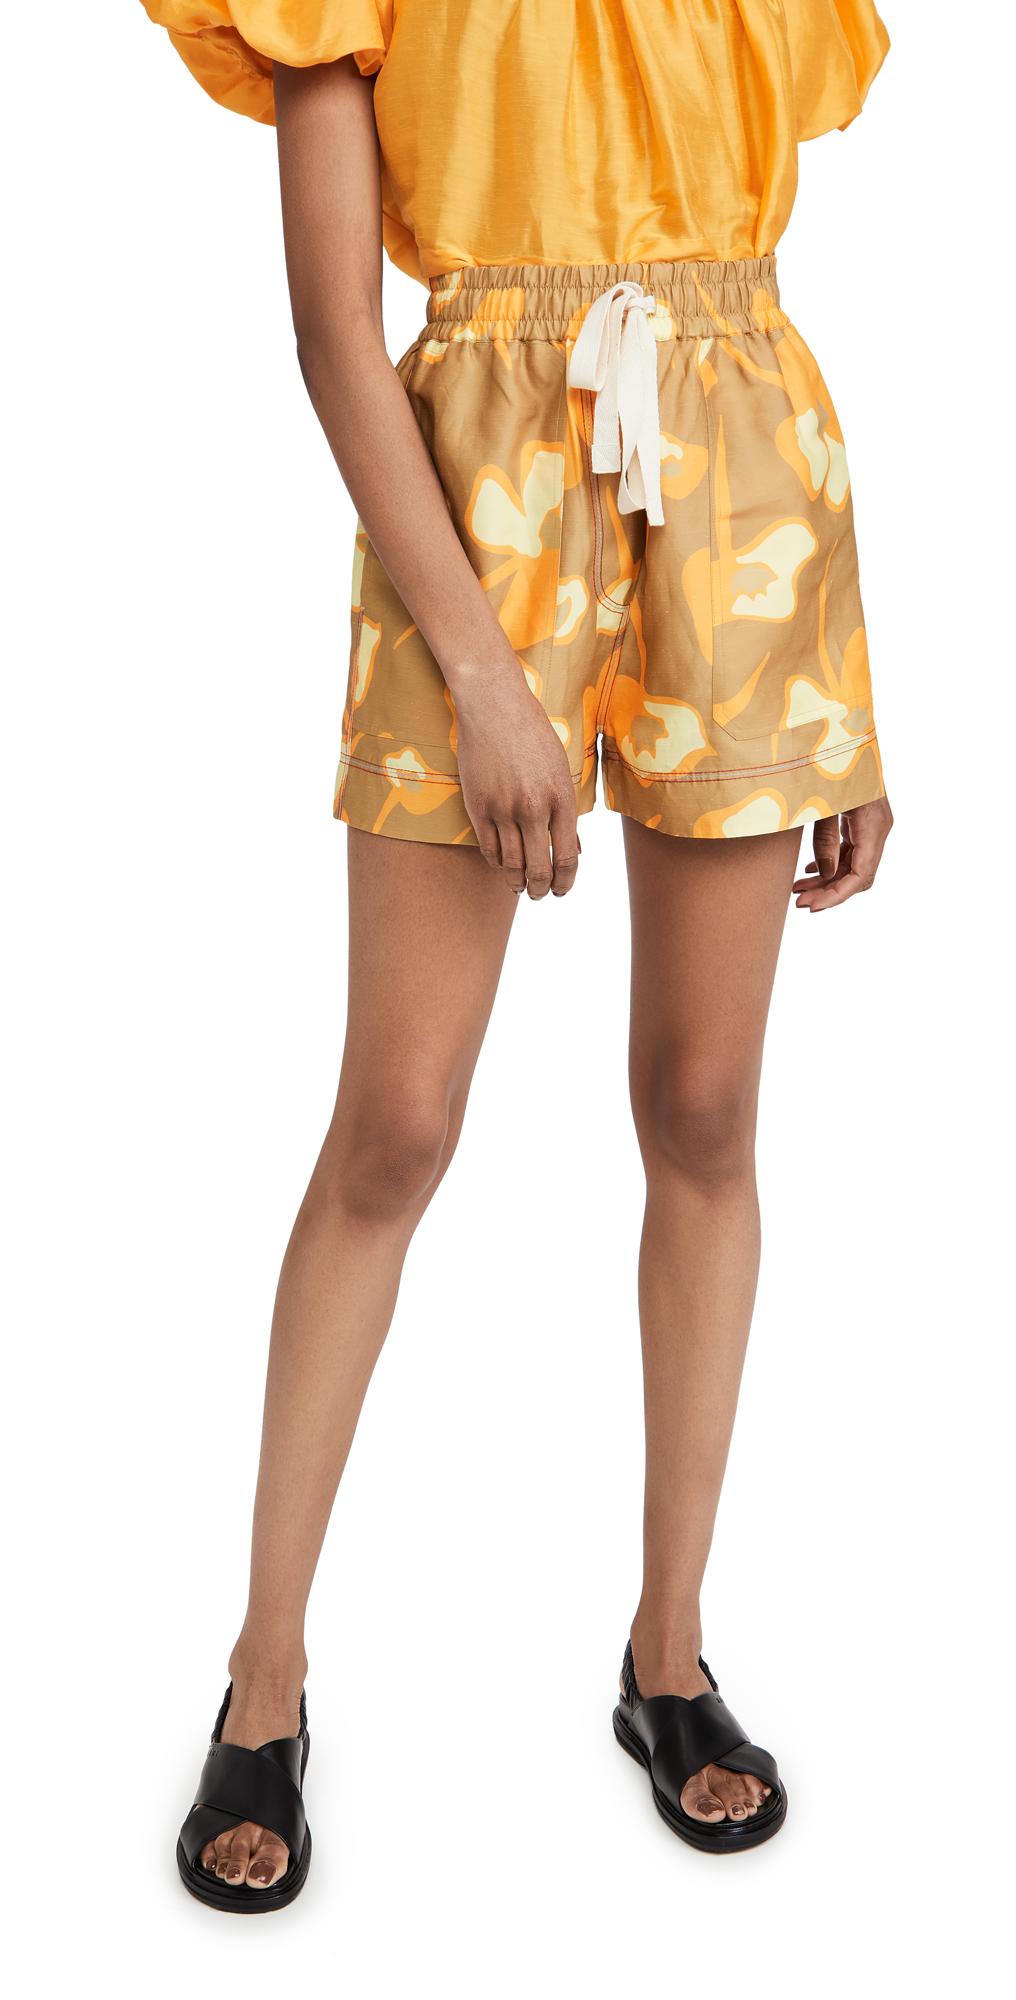 Lee Mathews Wren Shorts